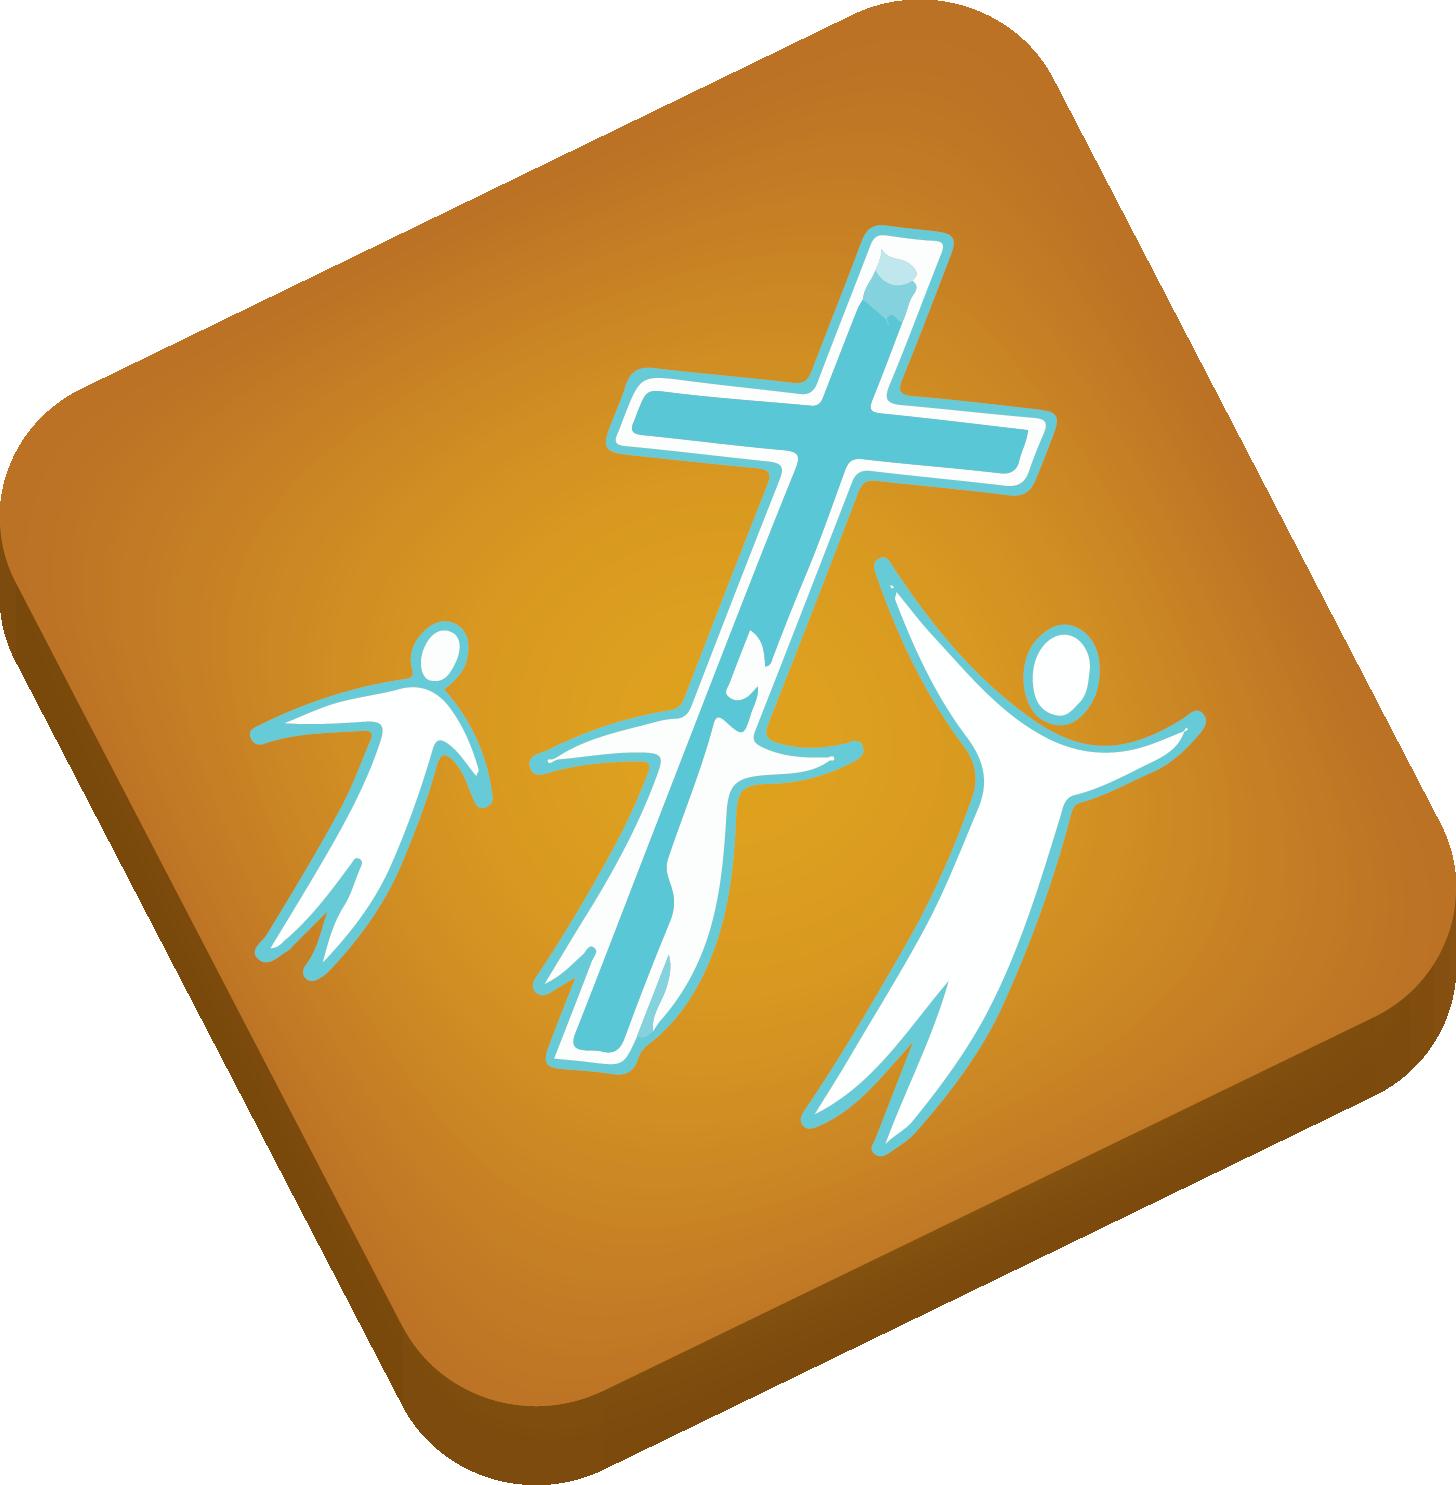 Pentecost clipart pentecostal, Pentecost pentecostal.